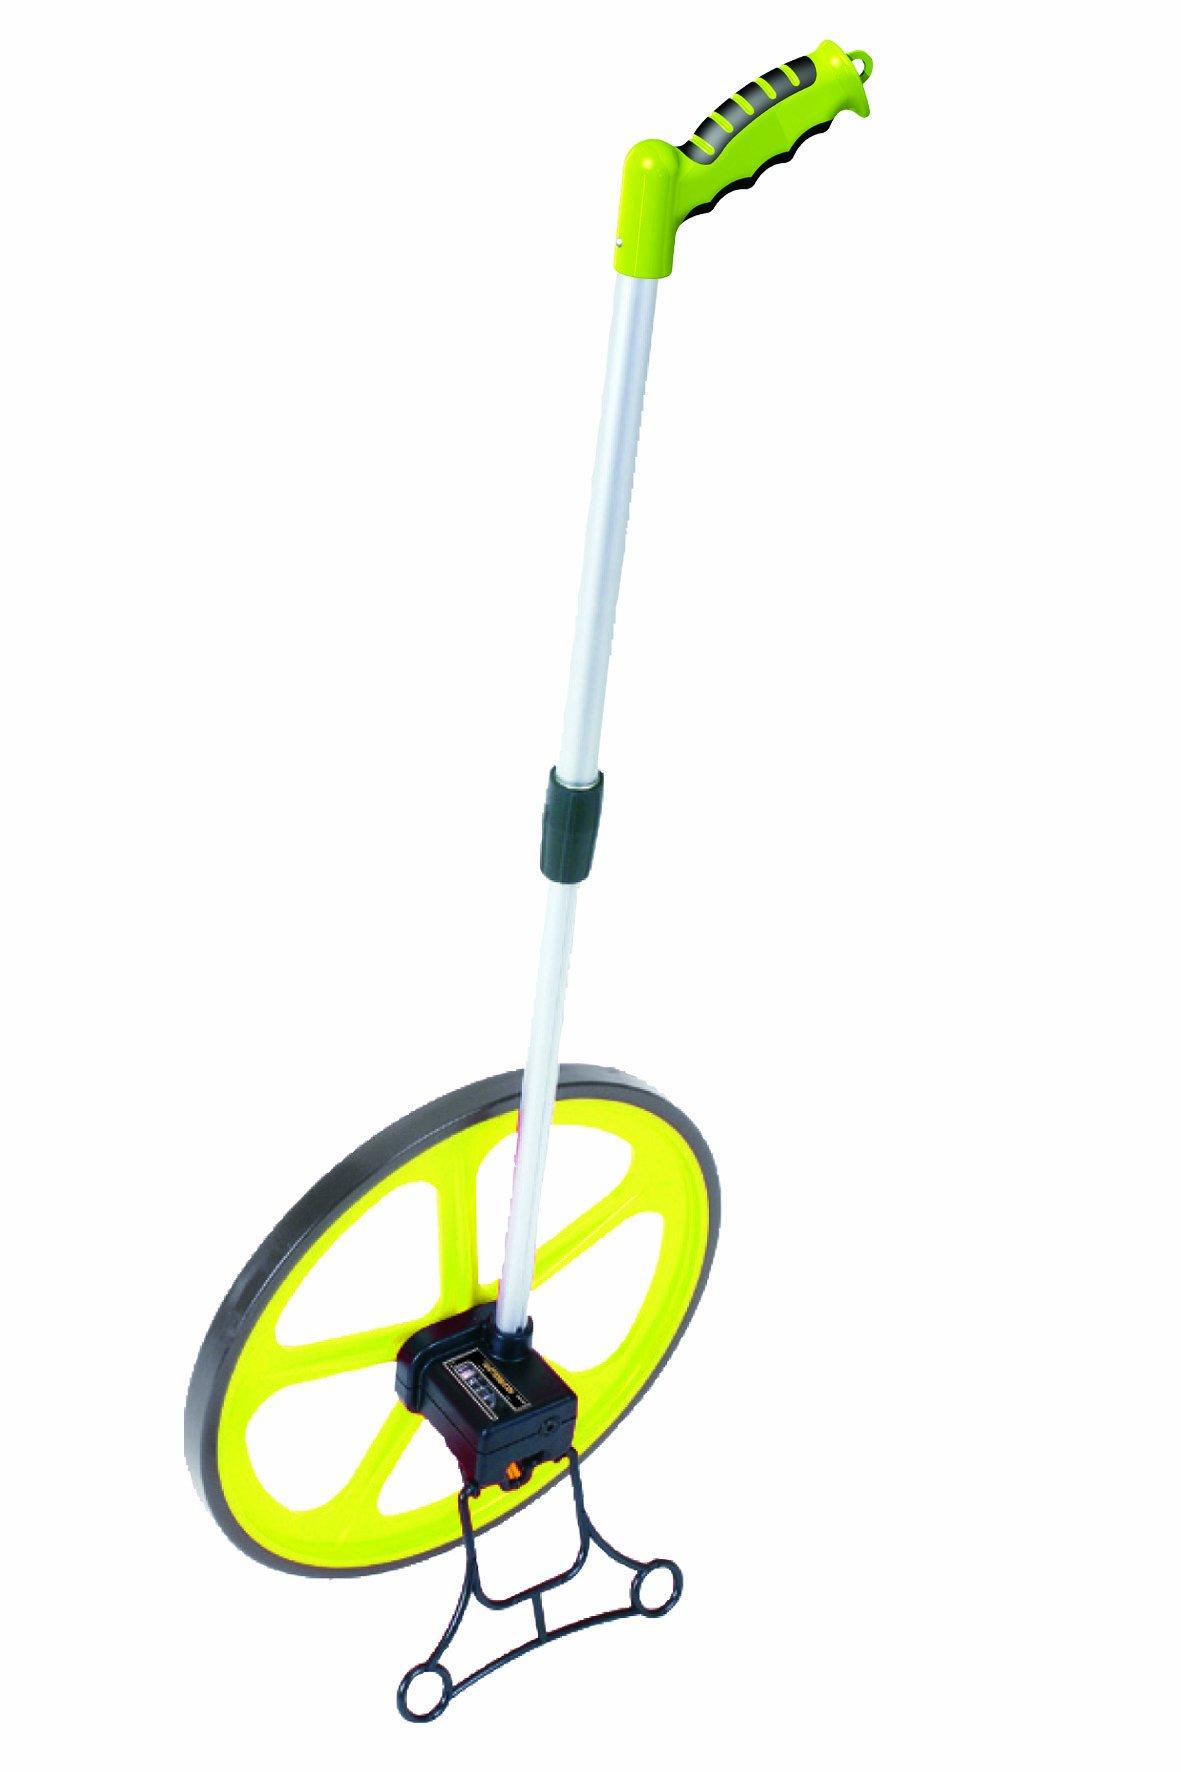 Mutual 17702 W45 Series Komelon Mechanical Measuring Wheel with Kickstand, 14.3'' Diameter, Feet/Inches